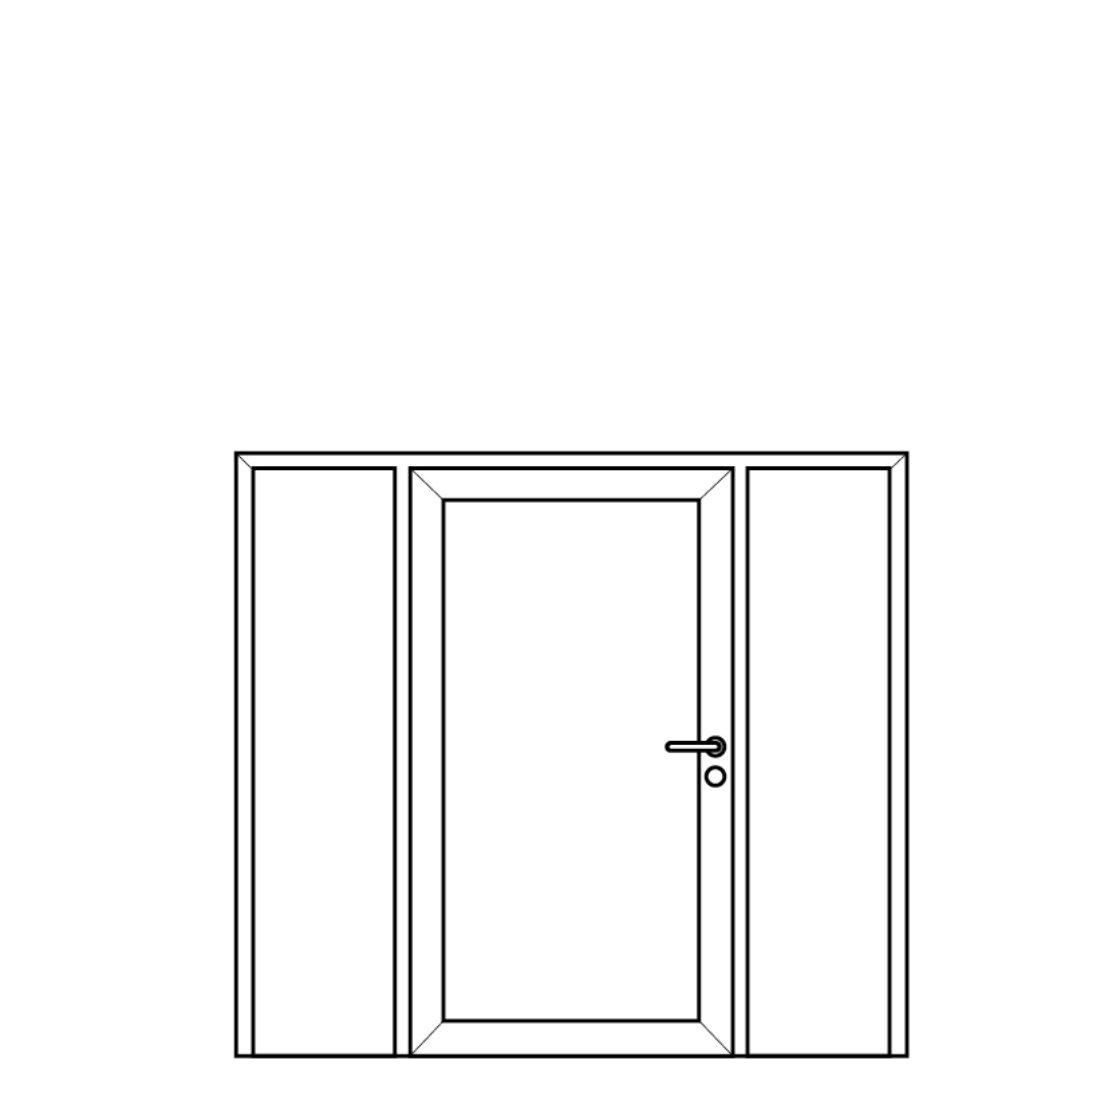 NorDan Alu Door Config Fixed Single Fixed